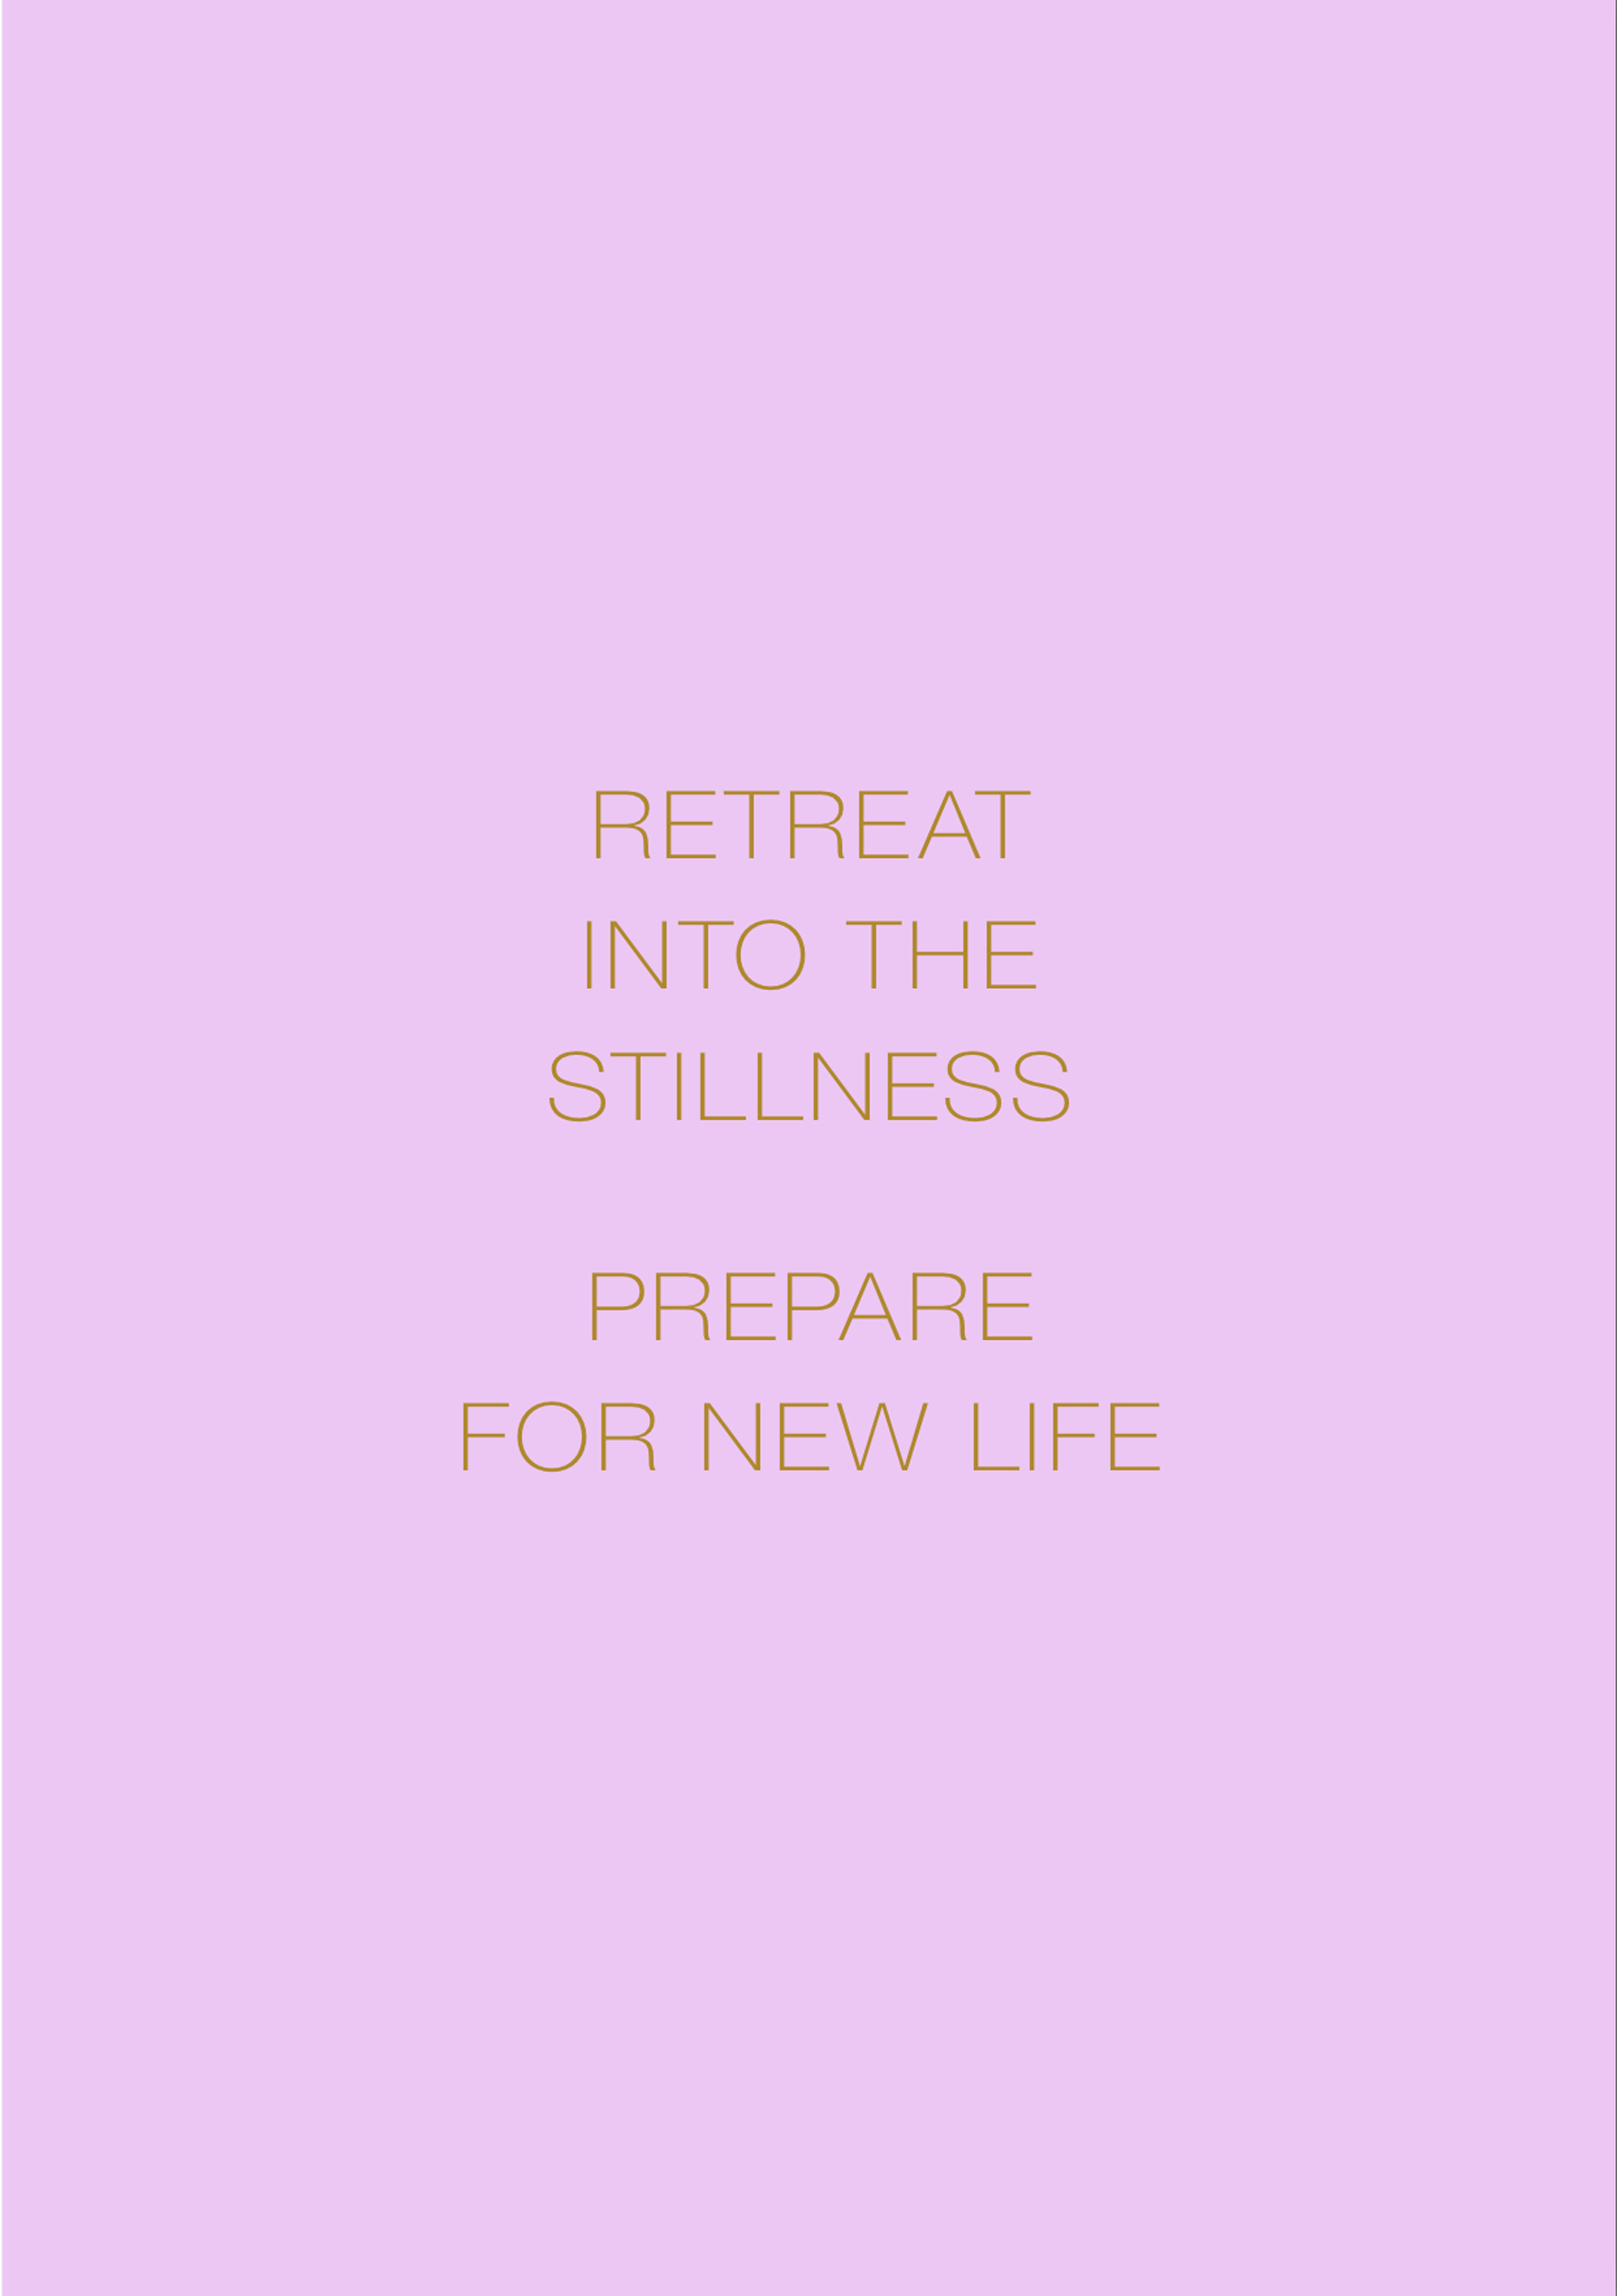 Chrysalis Mantra: Retreat Into the Stillness, Prepare for New Life